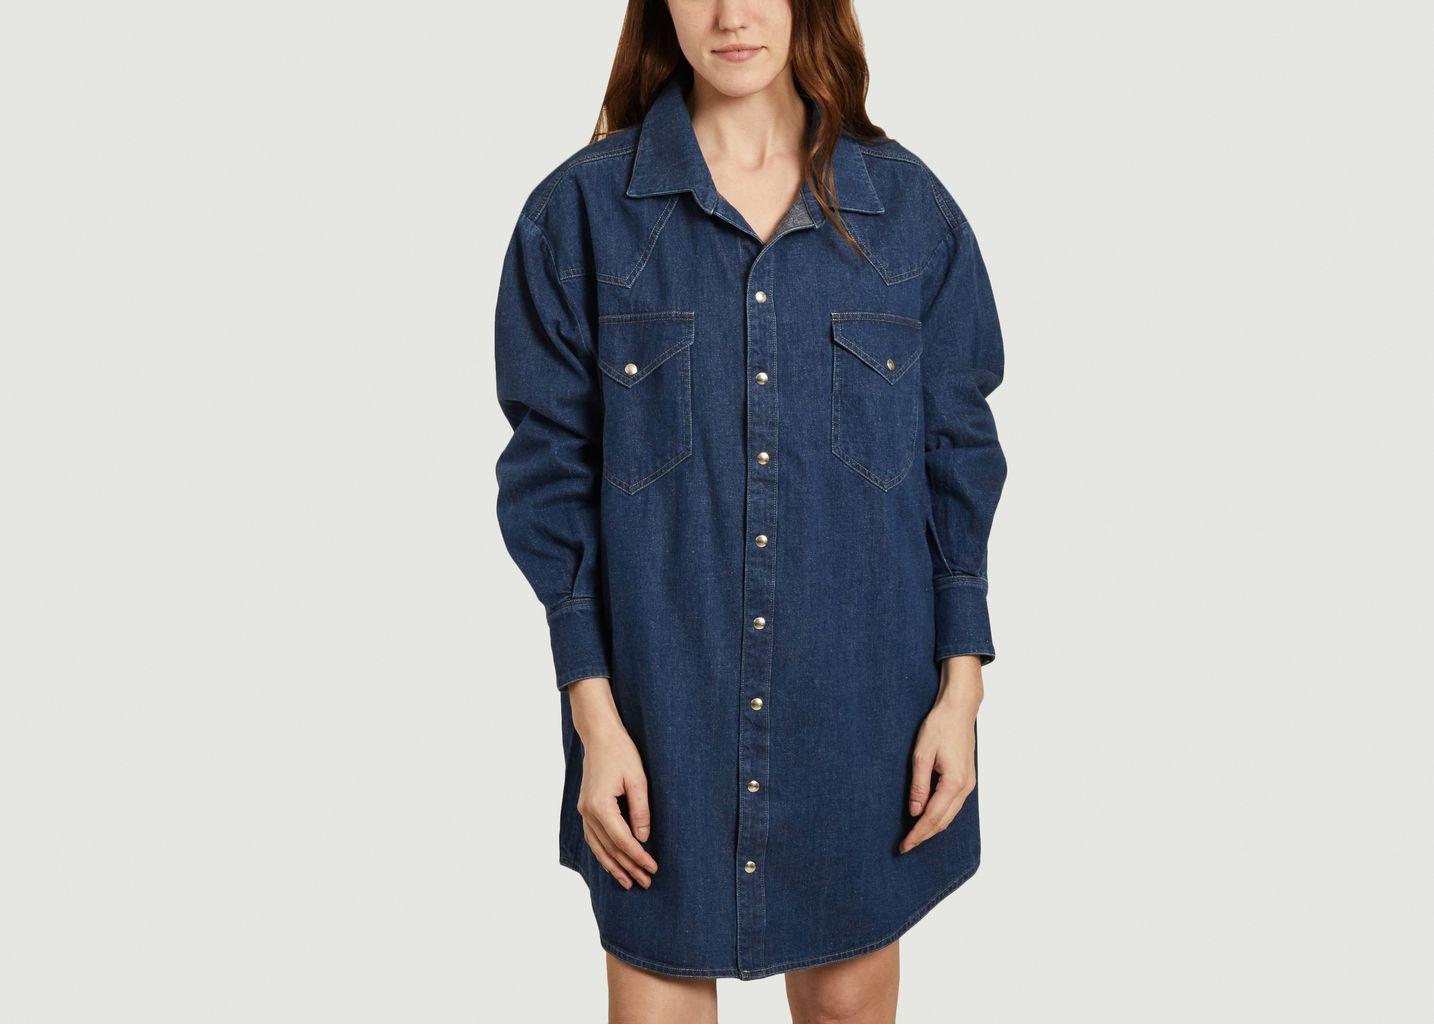 Robe-chemise oversize en jean Gloria - Façon Jacmin